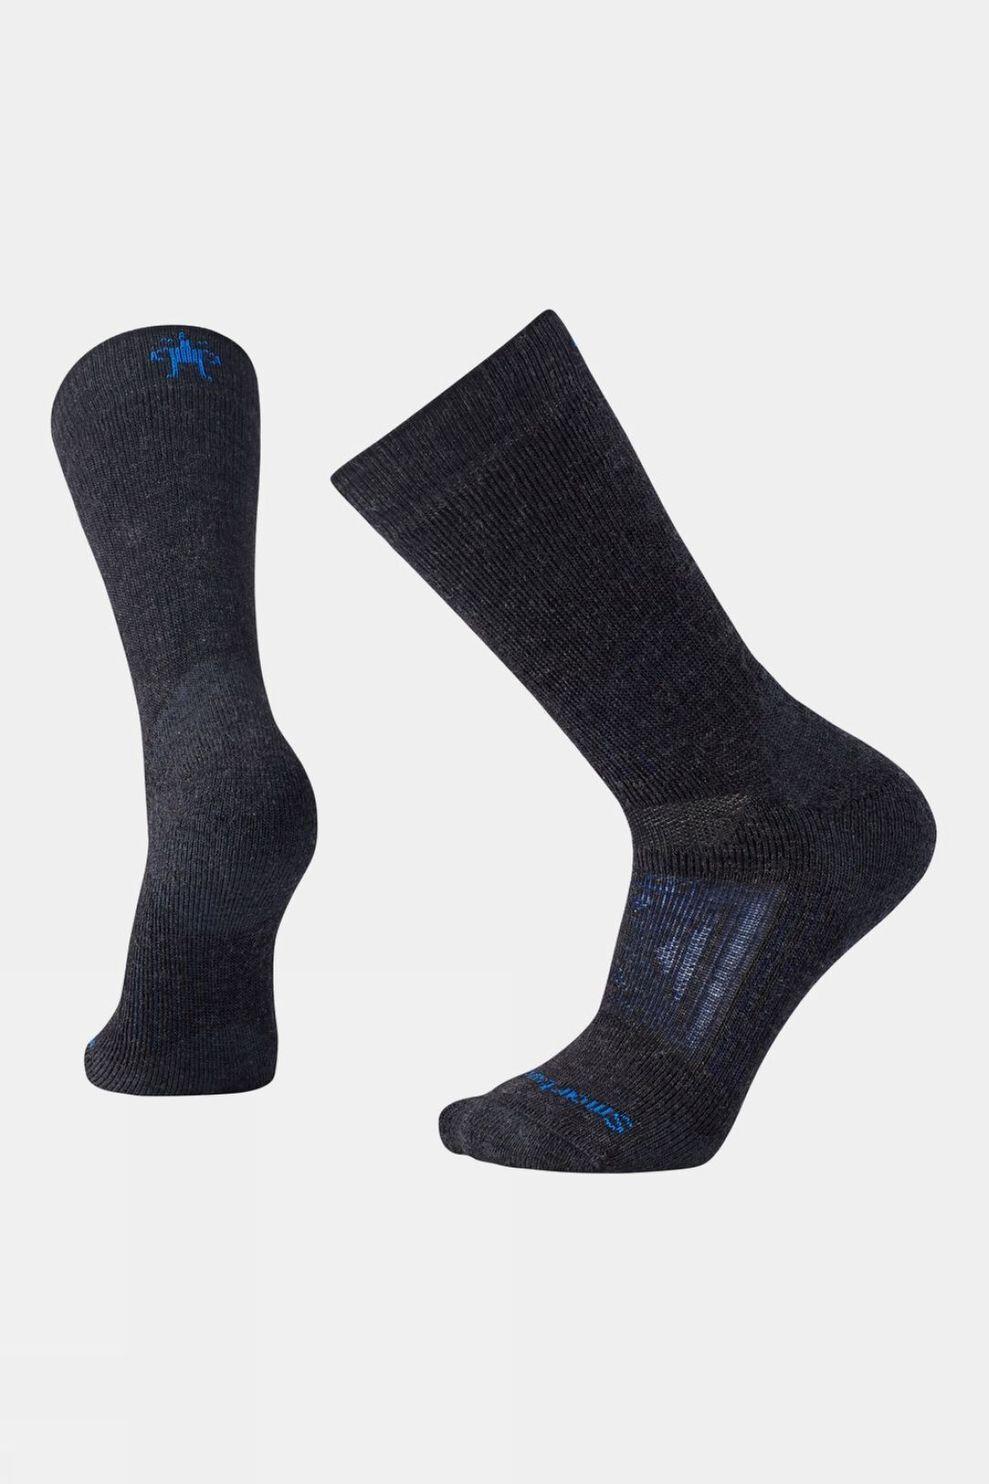 SmartWool Mens Performance Mountaineer Extra Cushion Crew Socks